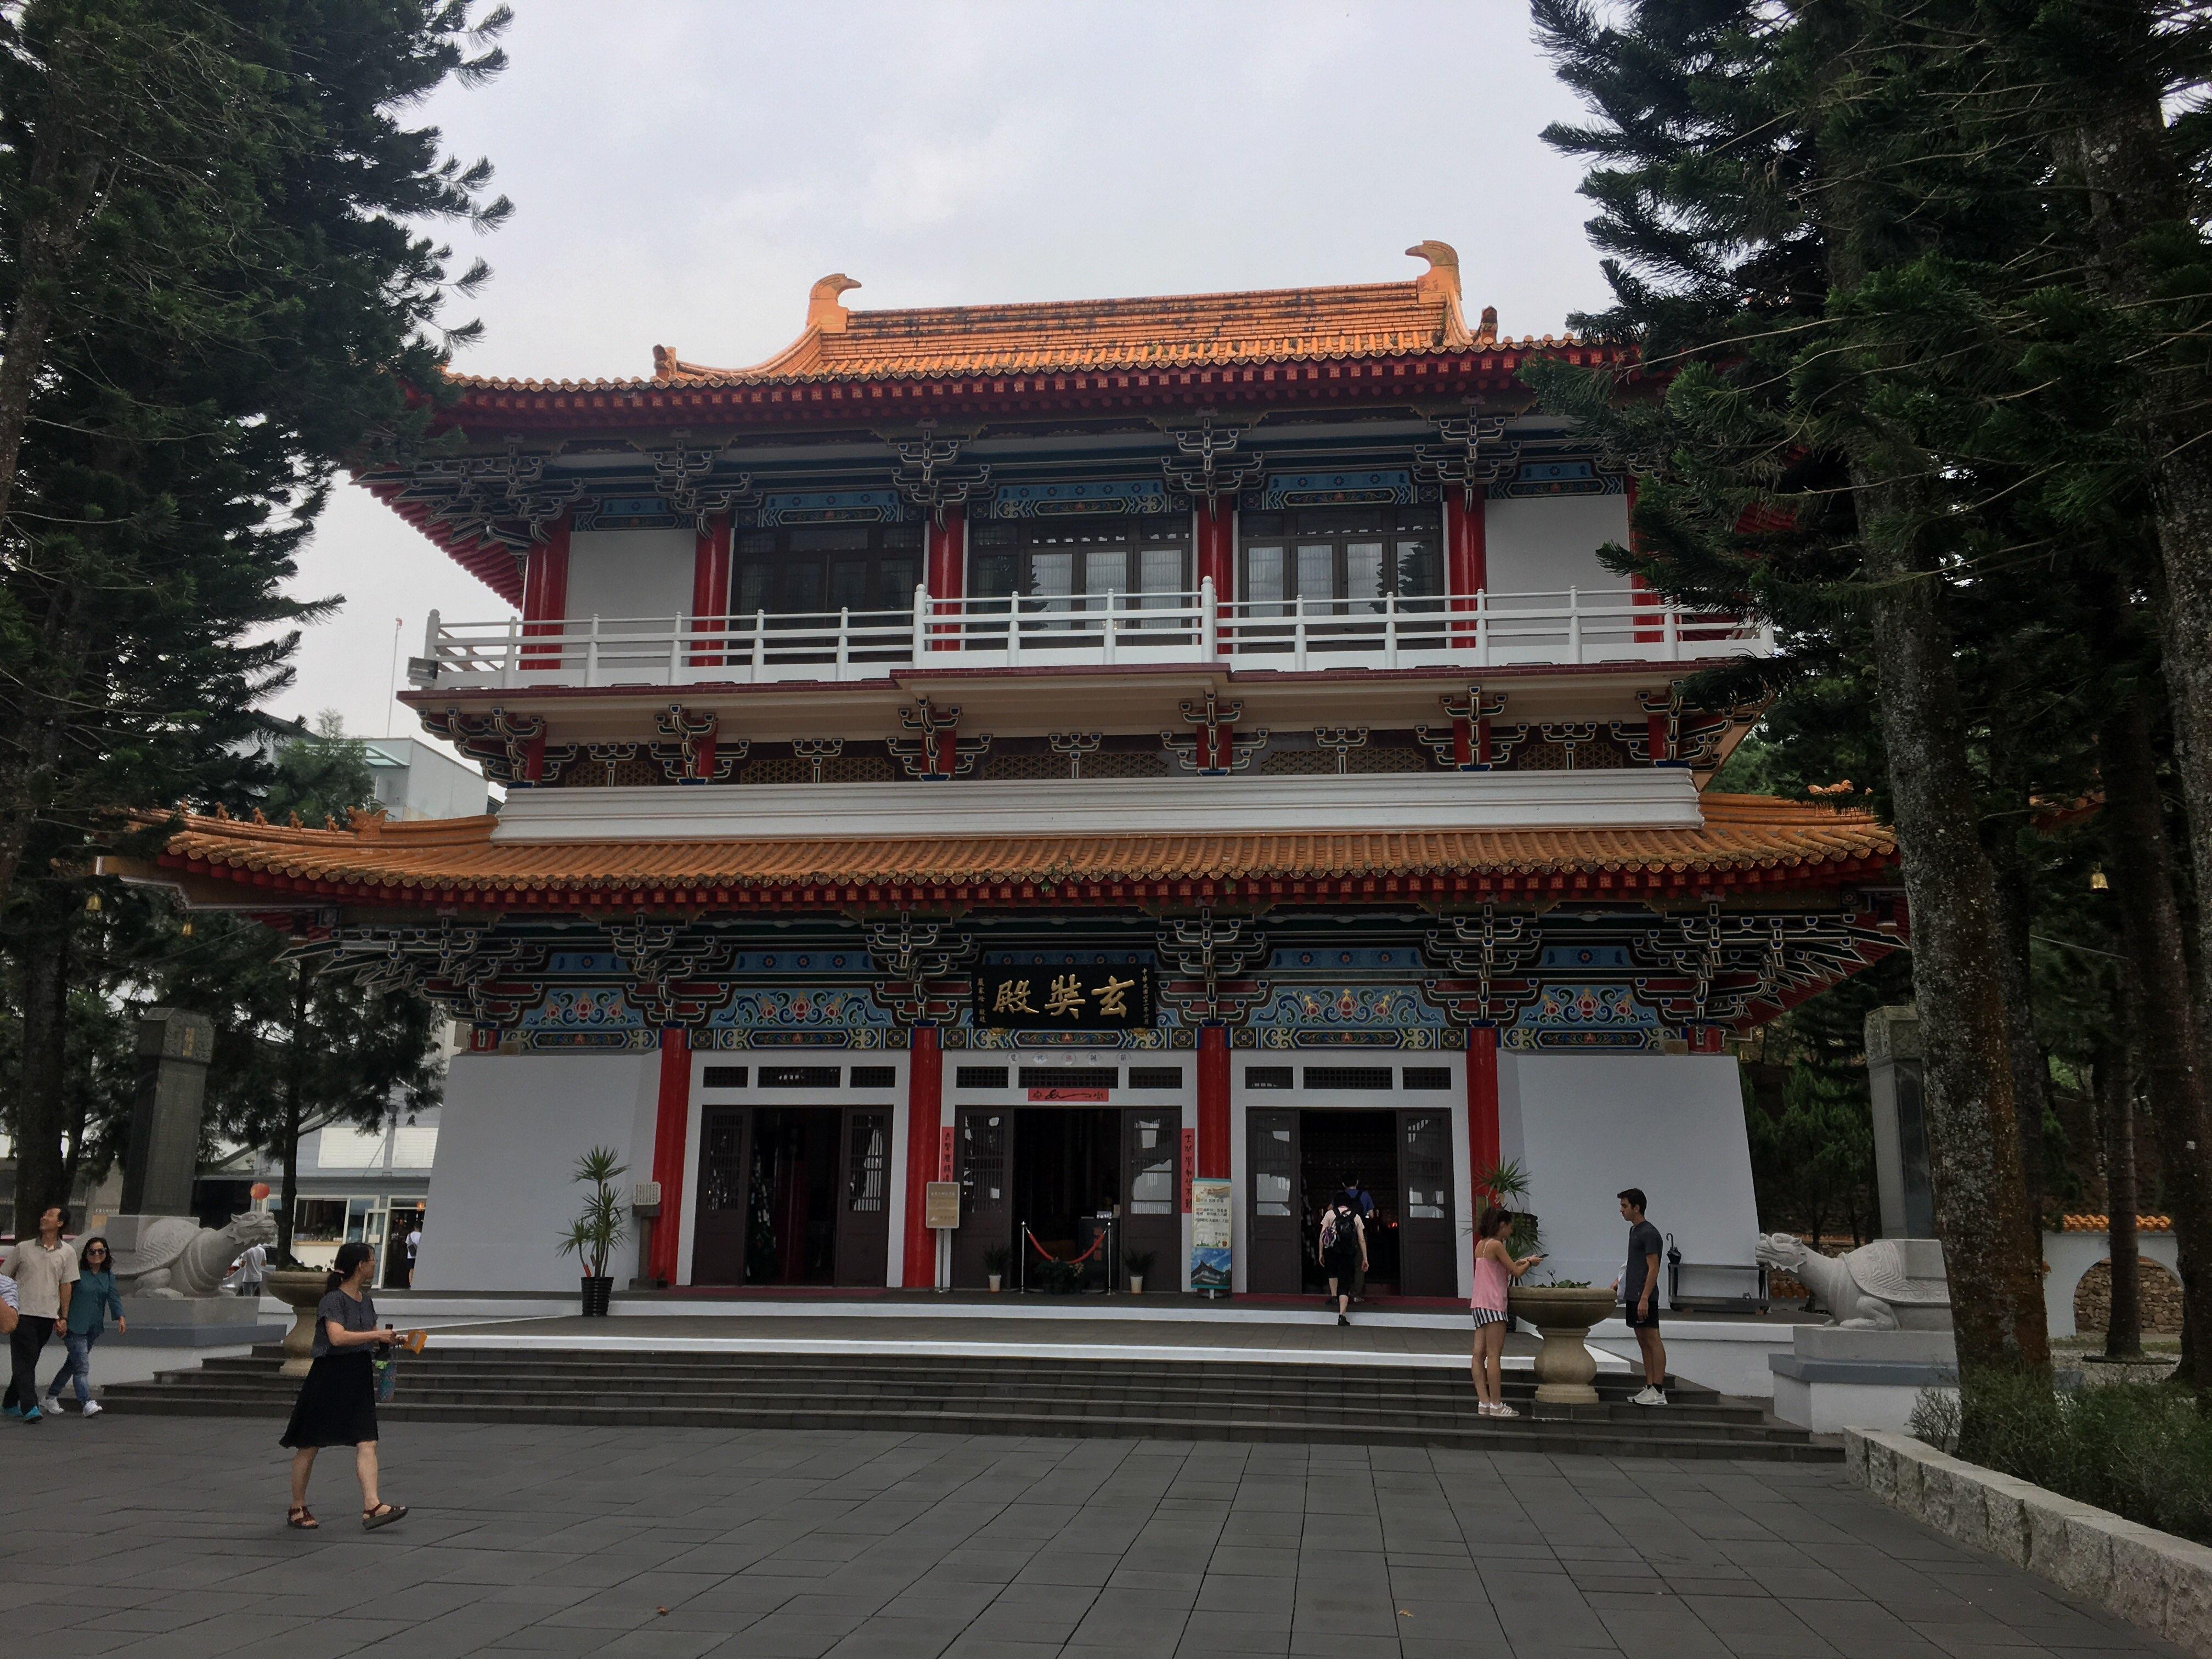 sun moon lake nantou xuan zang memorial hall